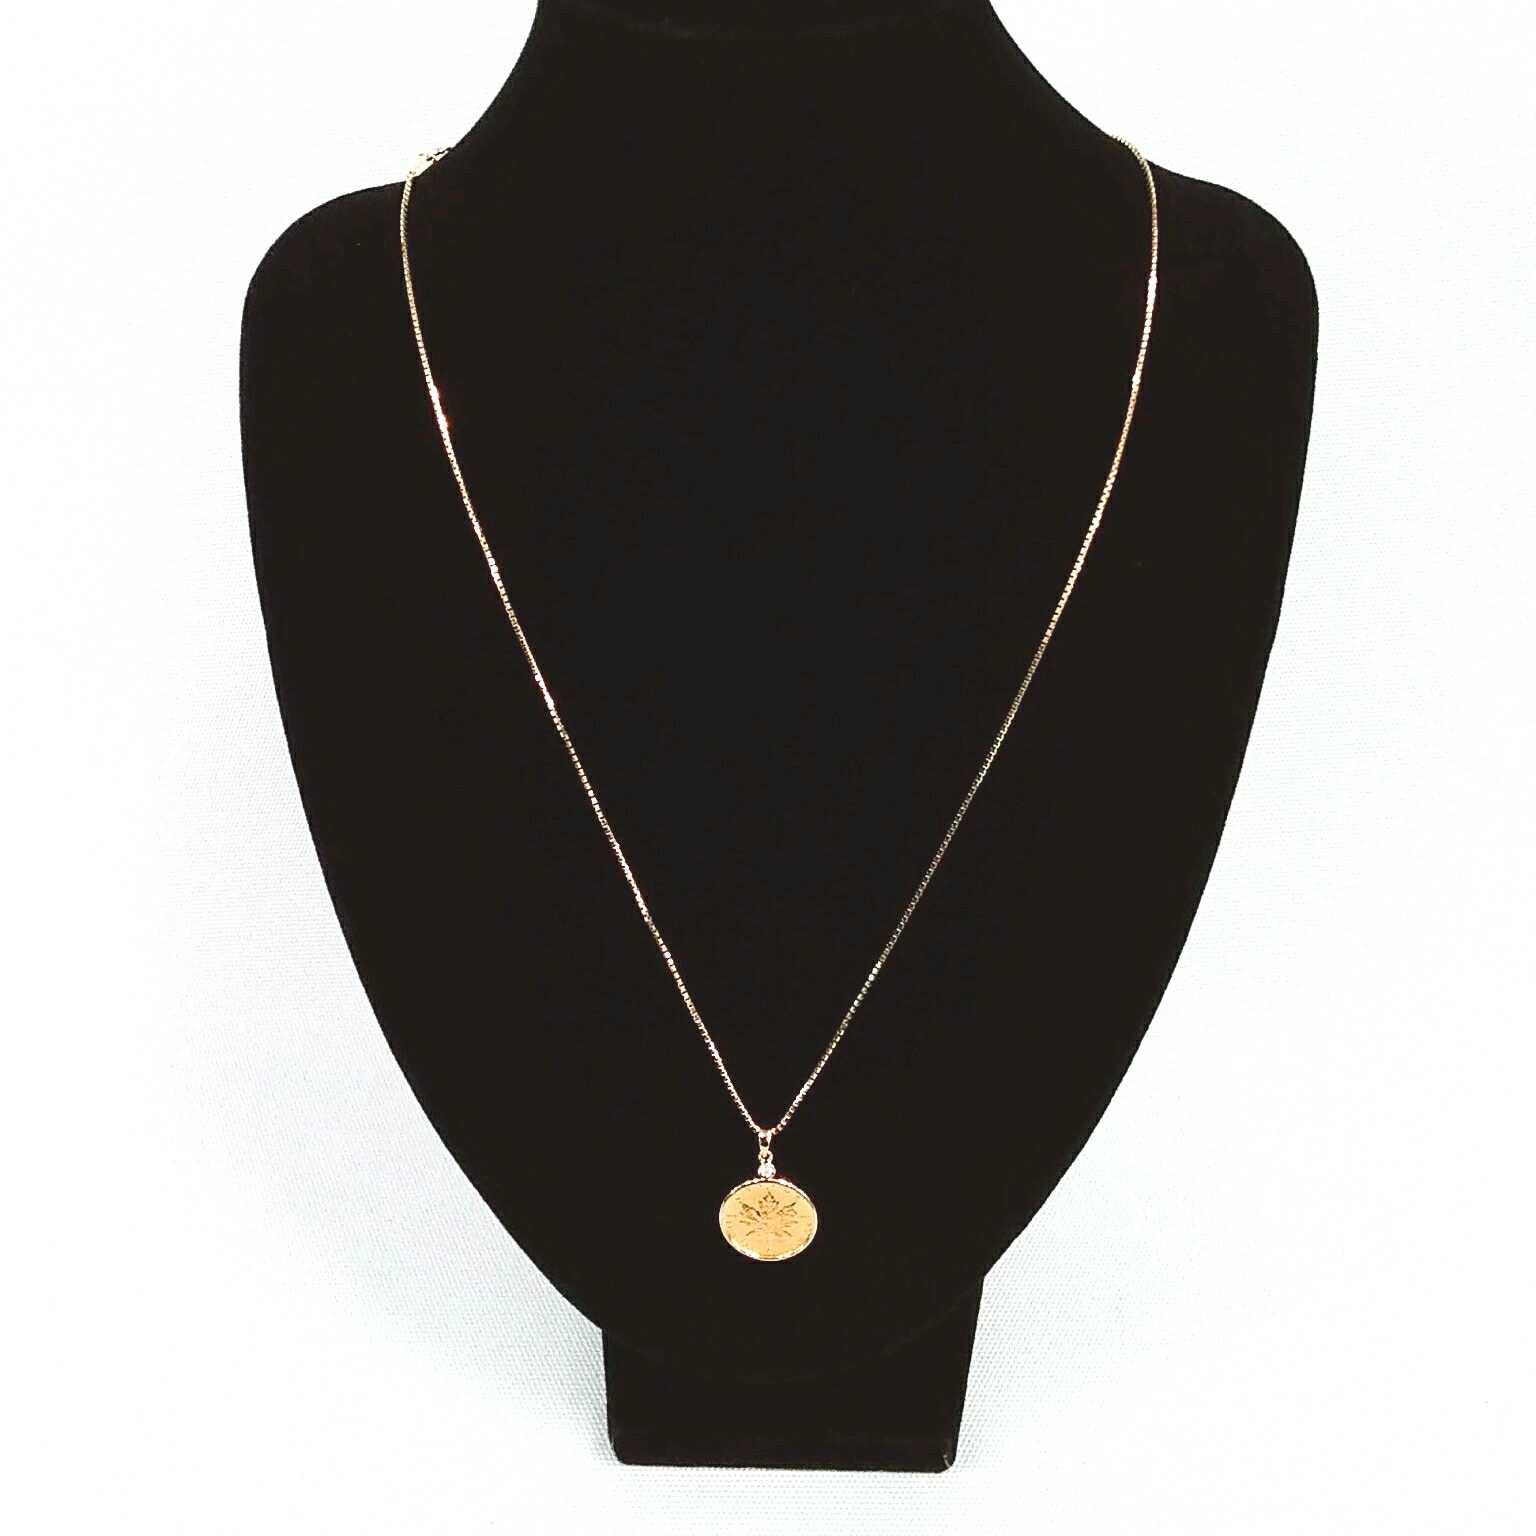 K18メープルリーフコインネックレス|宝石無しネックレス